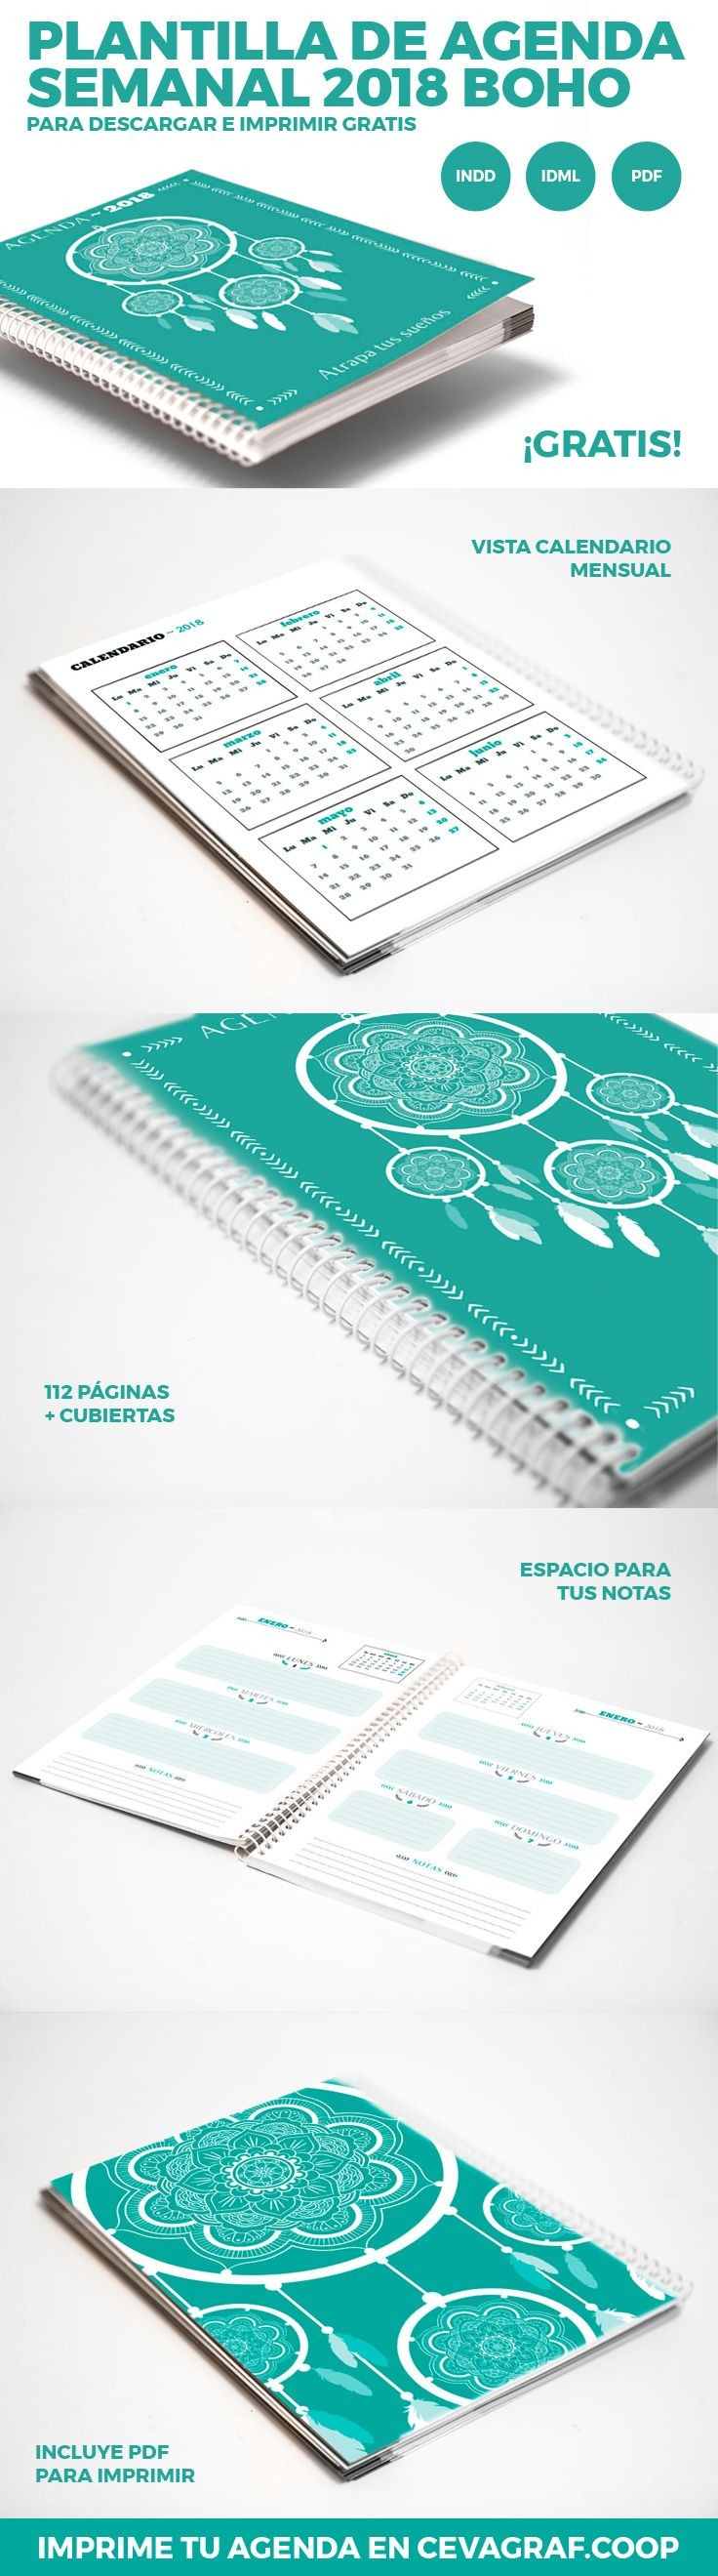 Calendario Para Imprimir 2017 Diciembre Más Actual 472 Best Agenda Images On Pinterest Of Calendario Para Imprimir 2017 Diciembre Más Populares Genine Delahaye Fondos